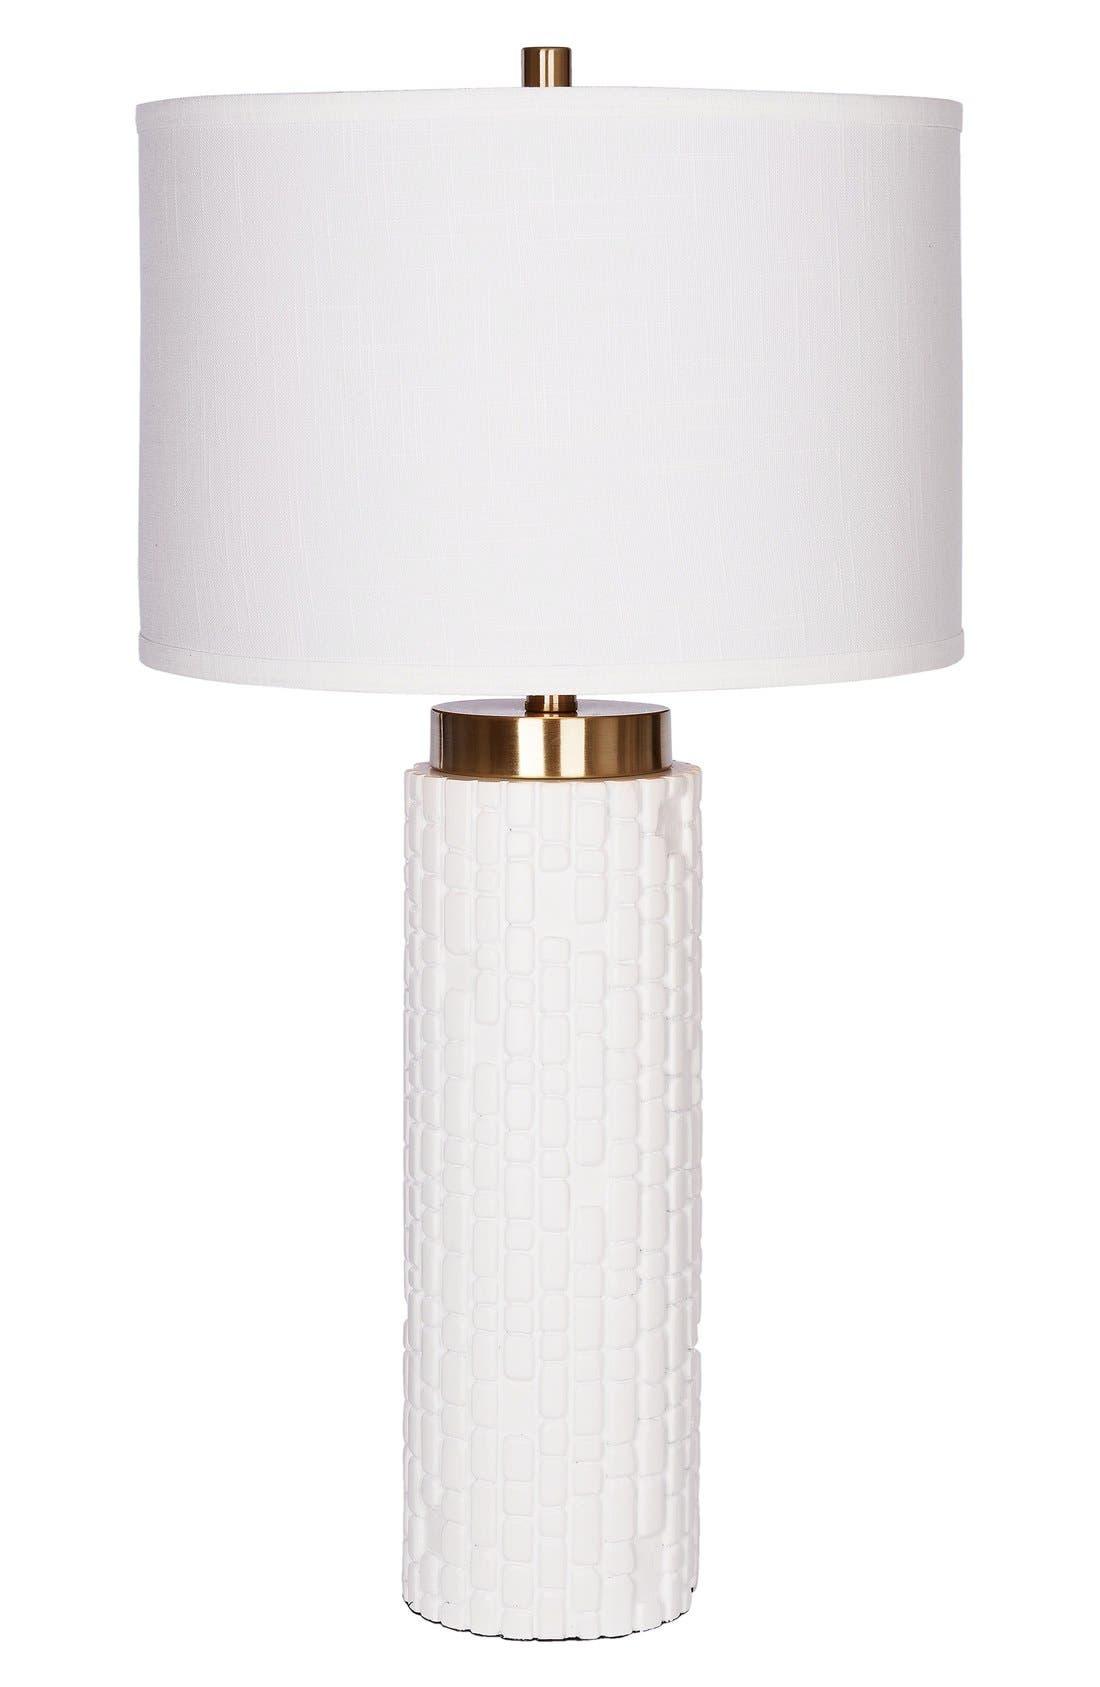 Main Image - JAlexander Mya Cylinder Table Lamp